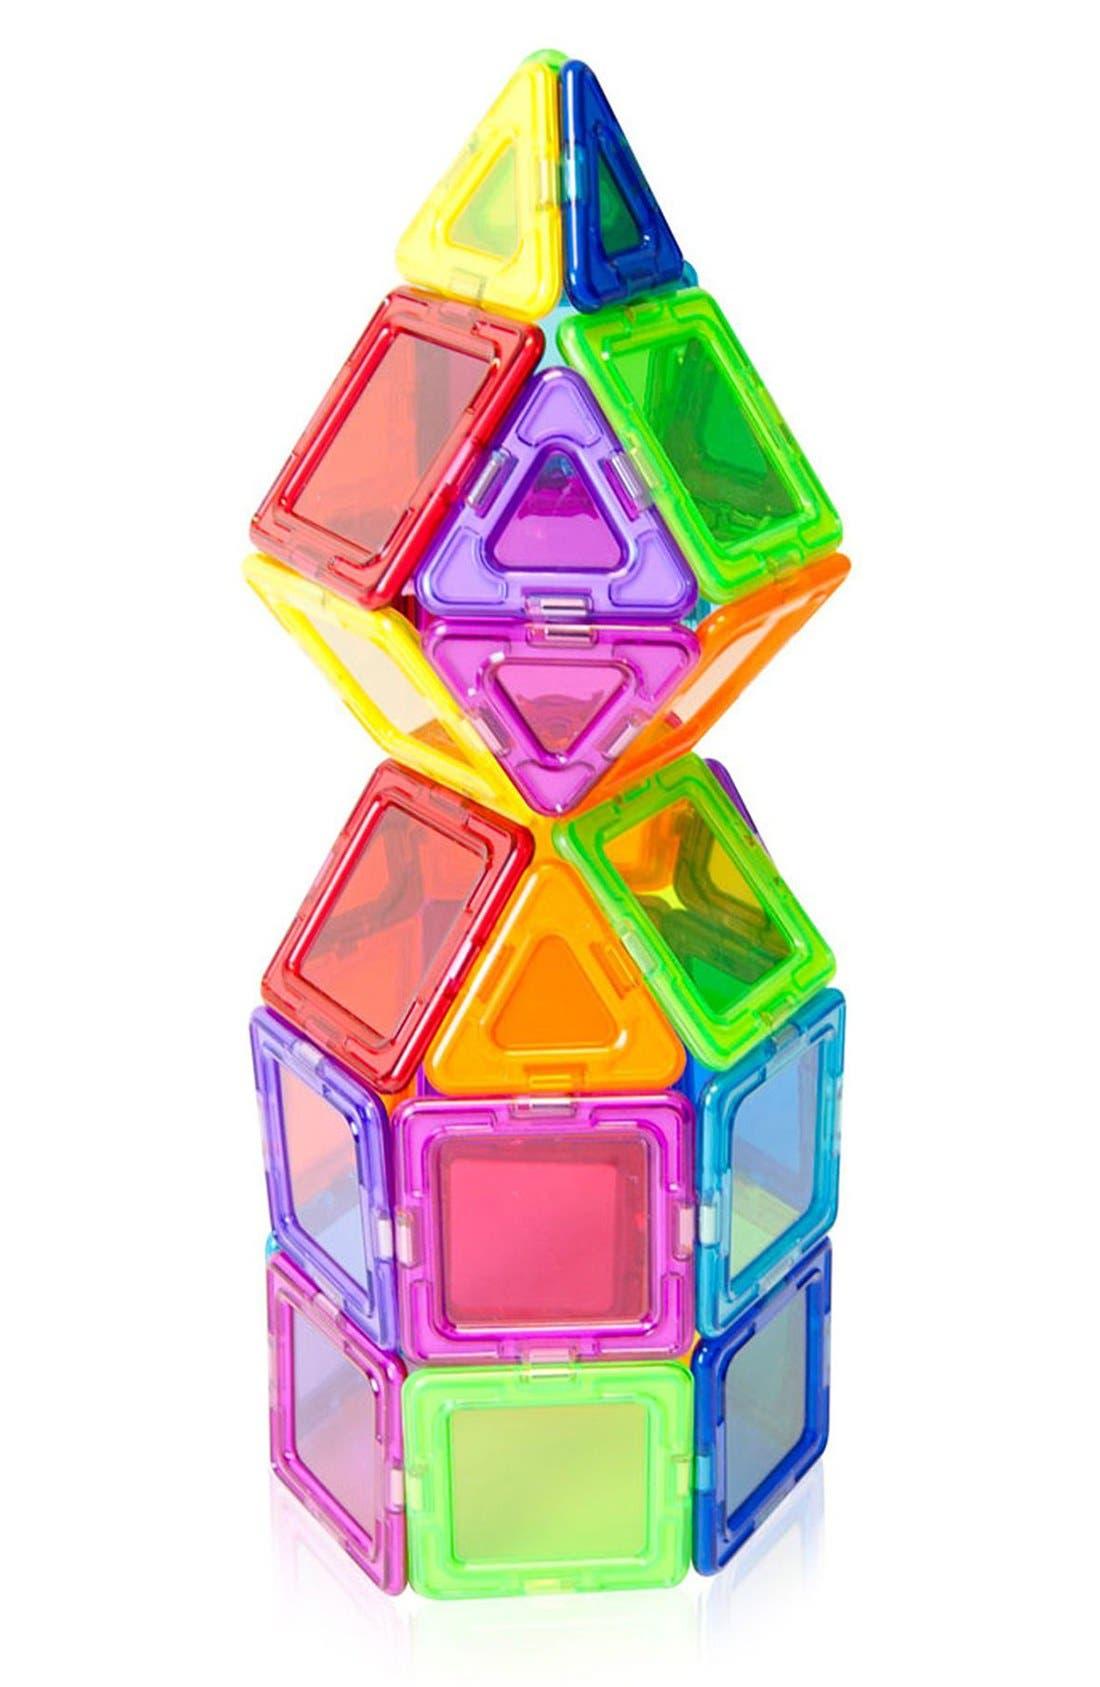 'Standard - Solids' Clear Magnetic 3D Construction Set,                             Alternate thumbnail 2, color,                             600